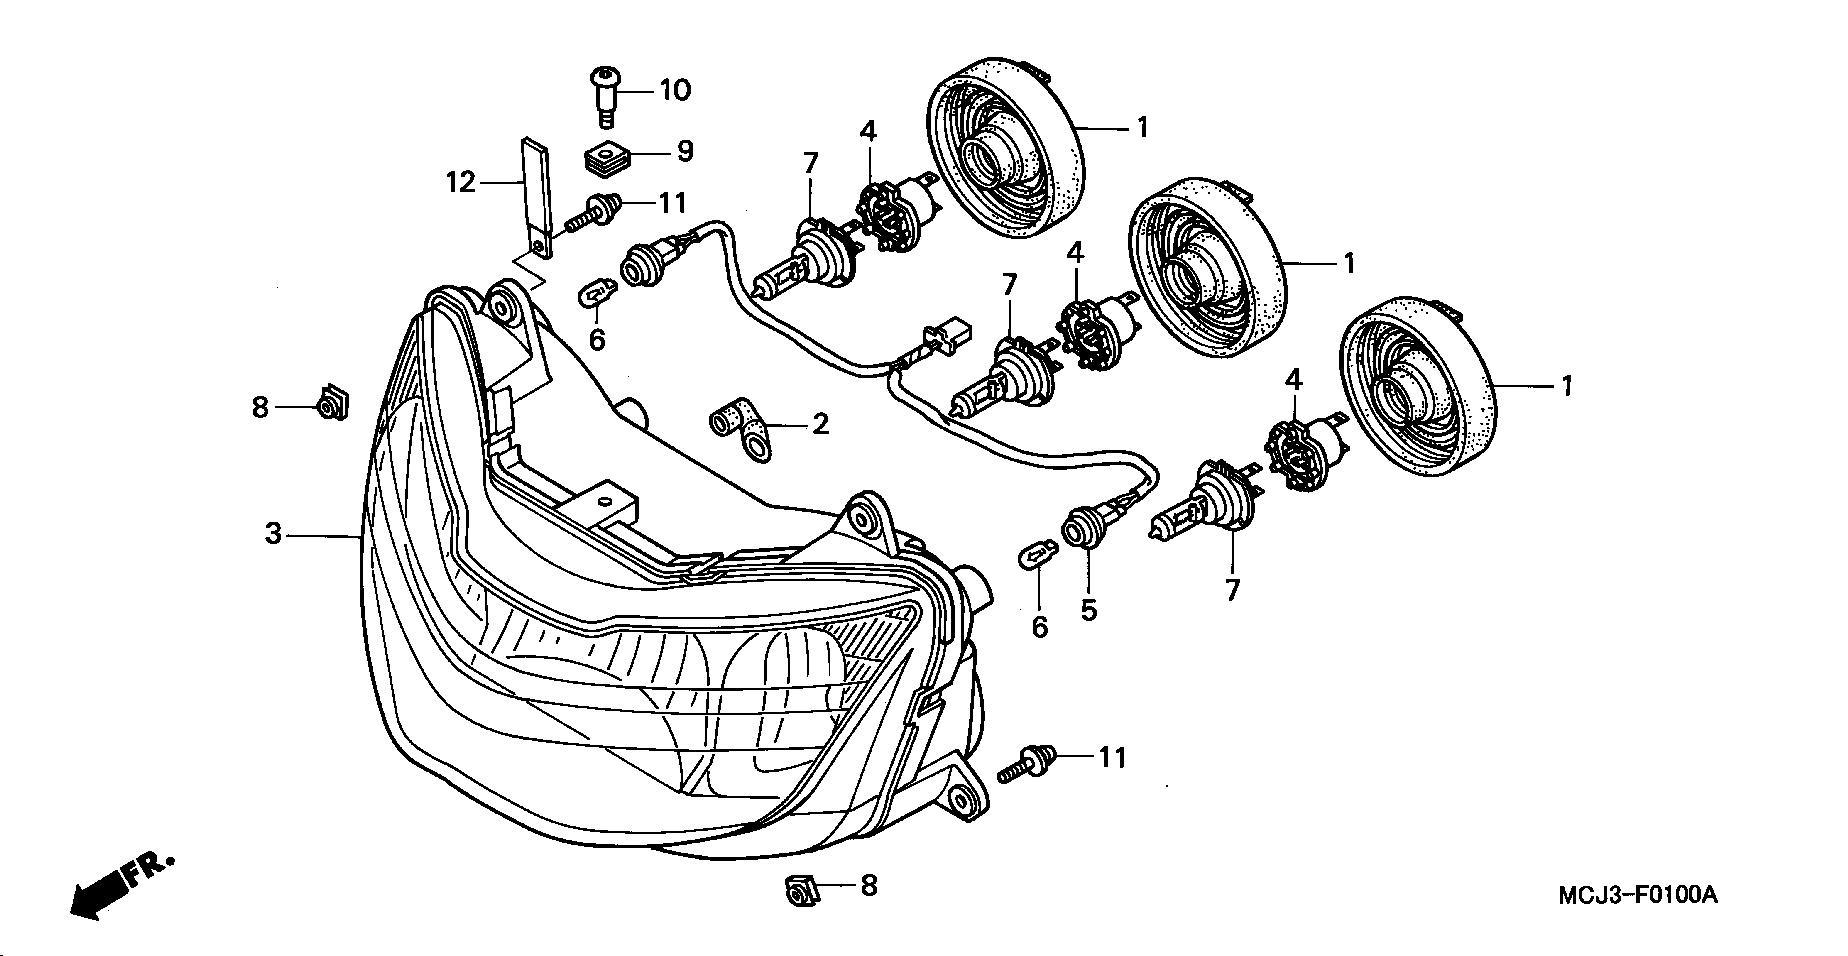 Cbr 954 Rr Wiring Diagram. . Wiring Diagram Honda Wiring Diagram on